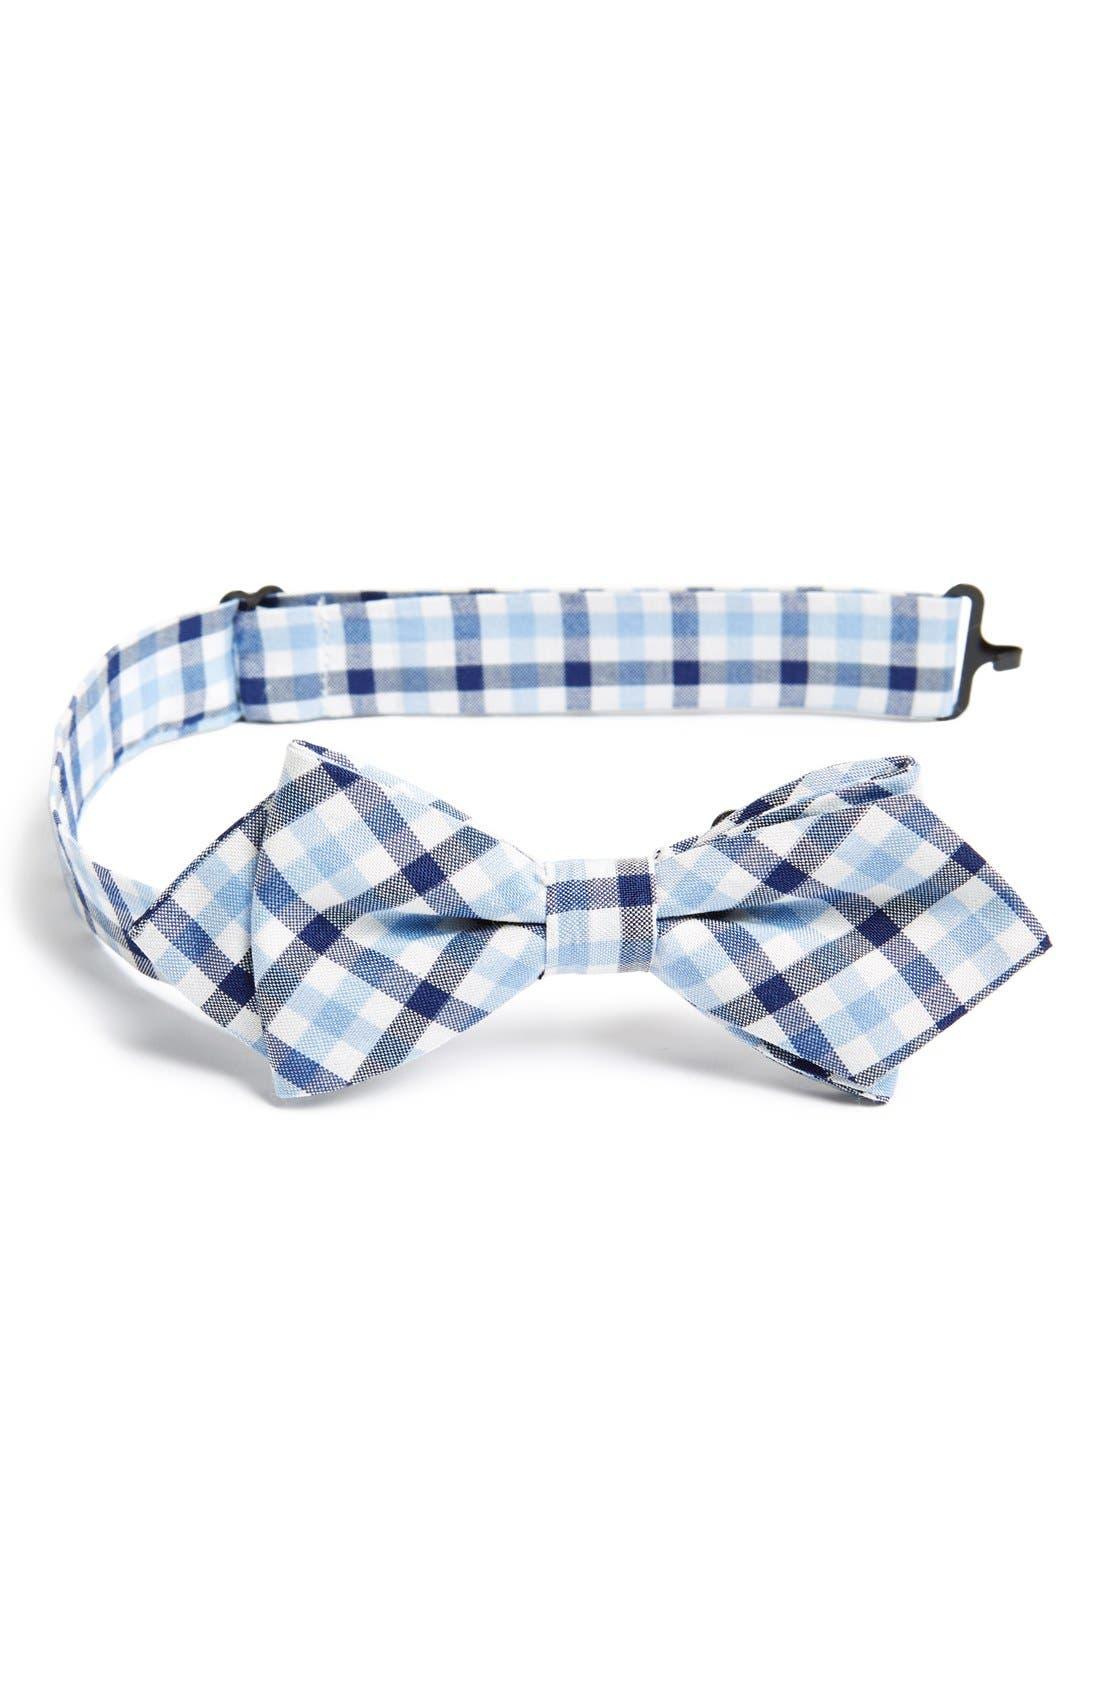 Main Image - Nordstrom Cotton Blend Bow Tie (Big Boys)